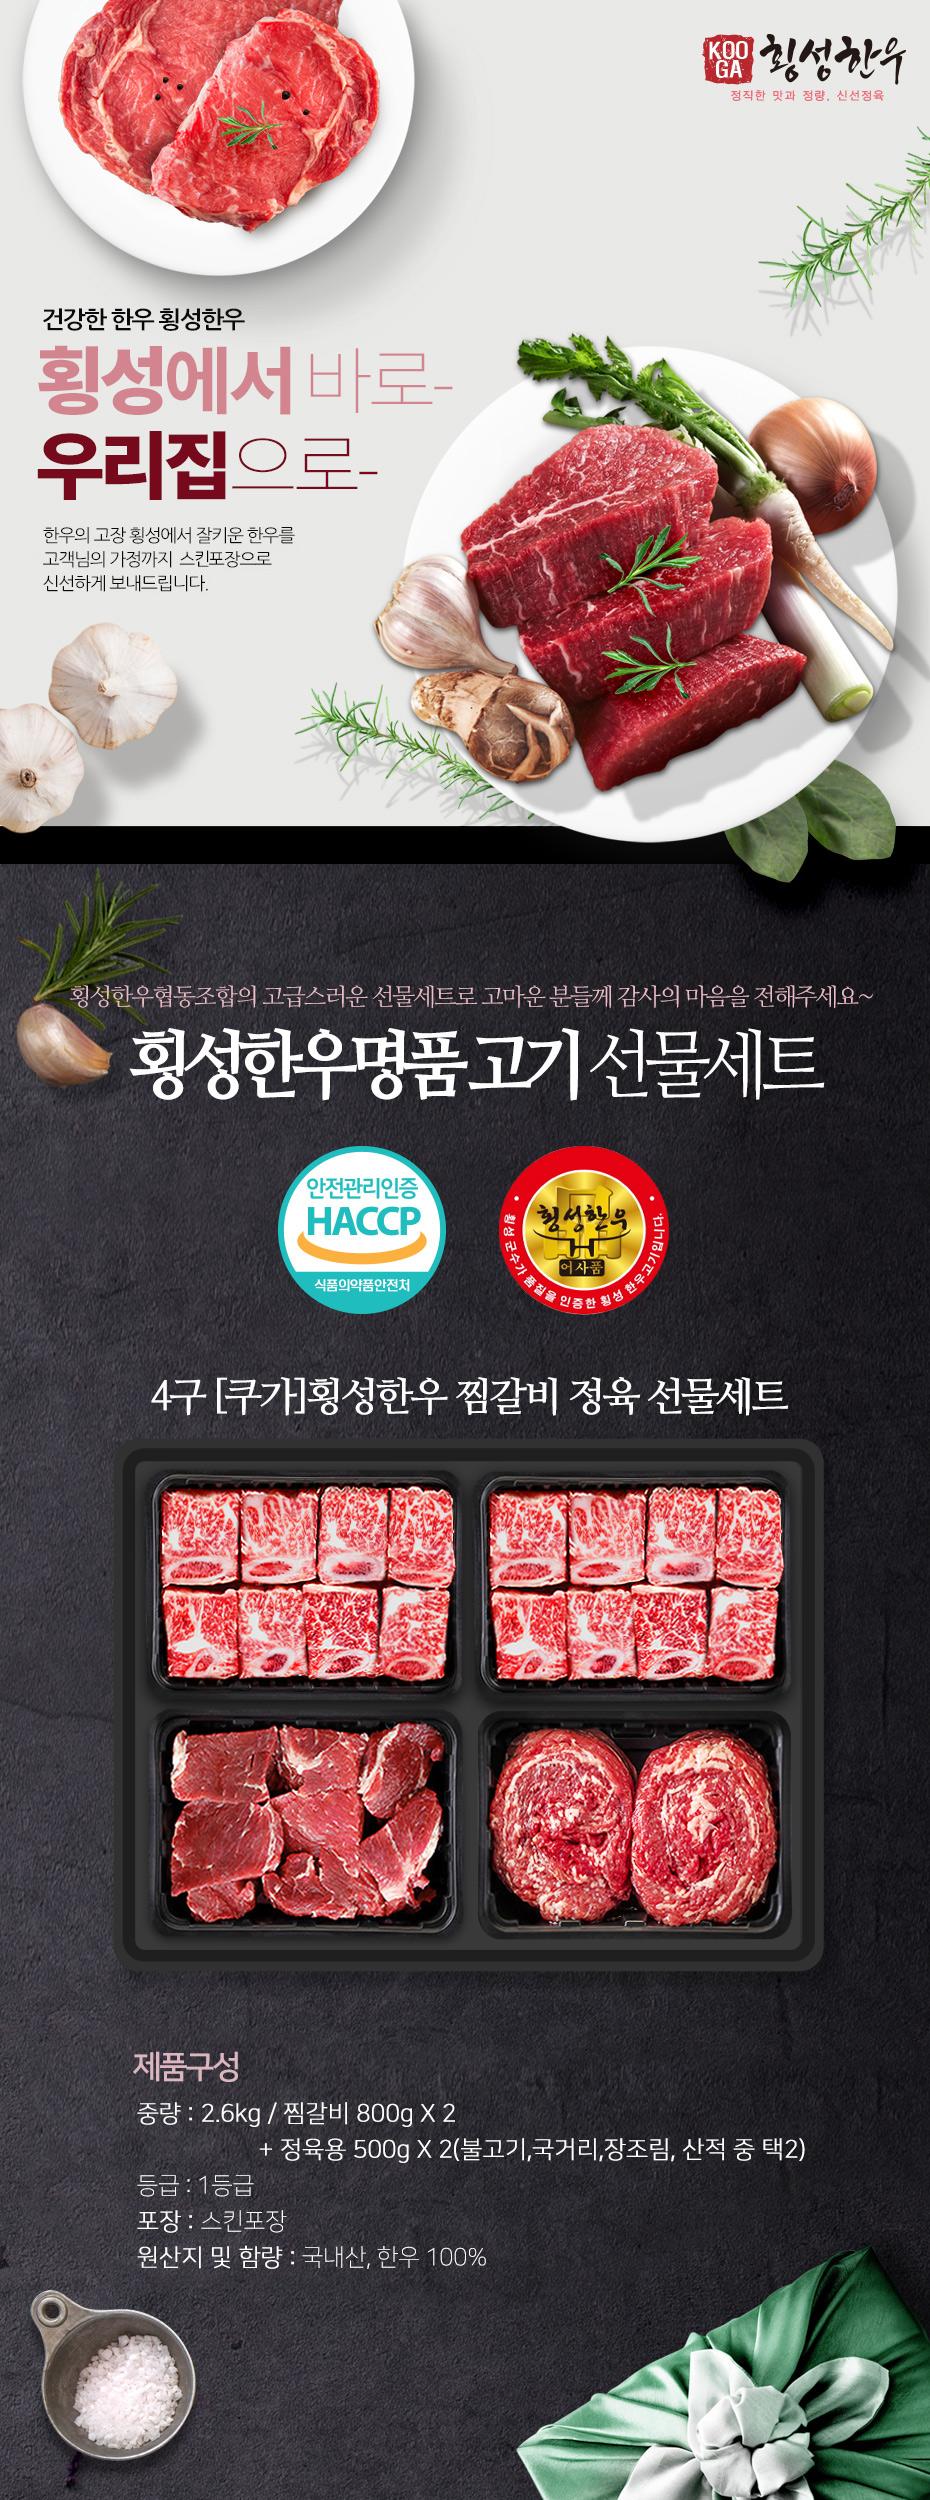 set4_meat_rib2_s2_015909.jpg